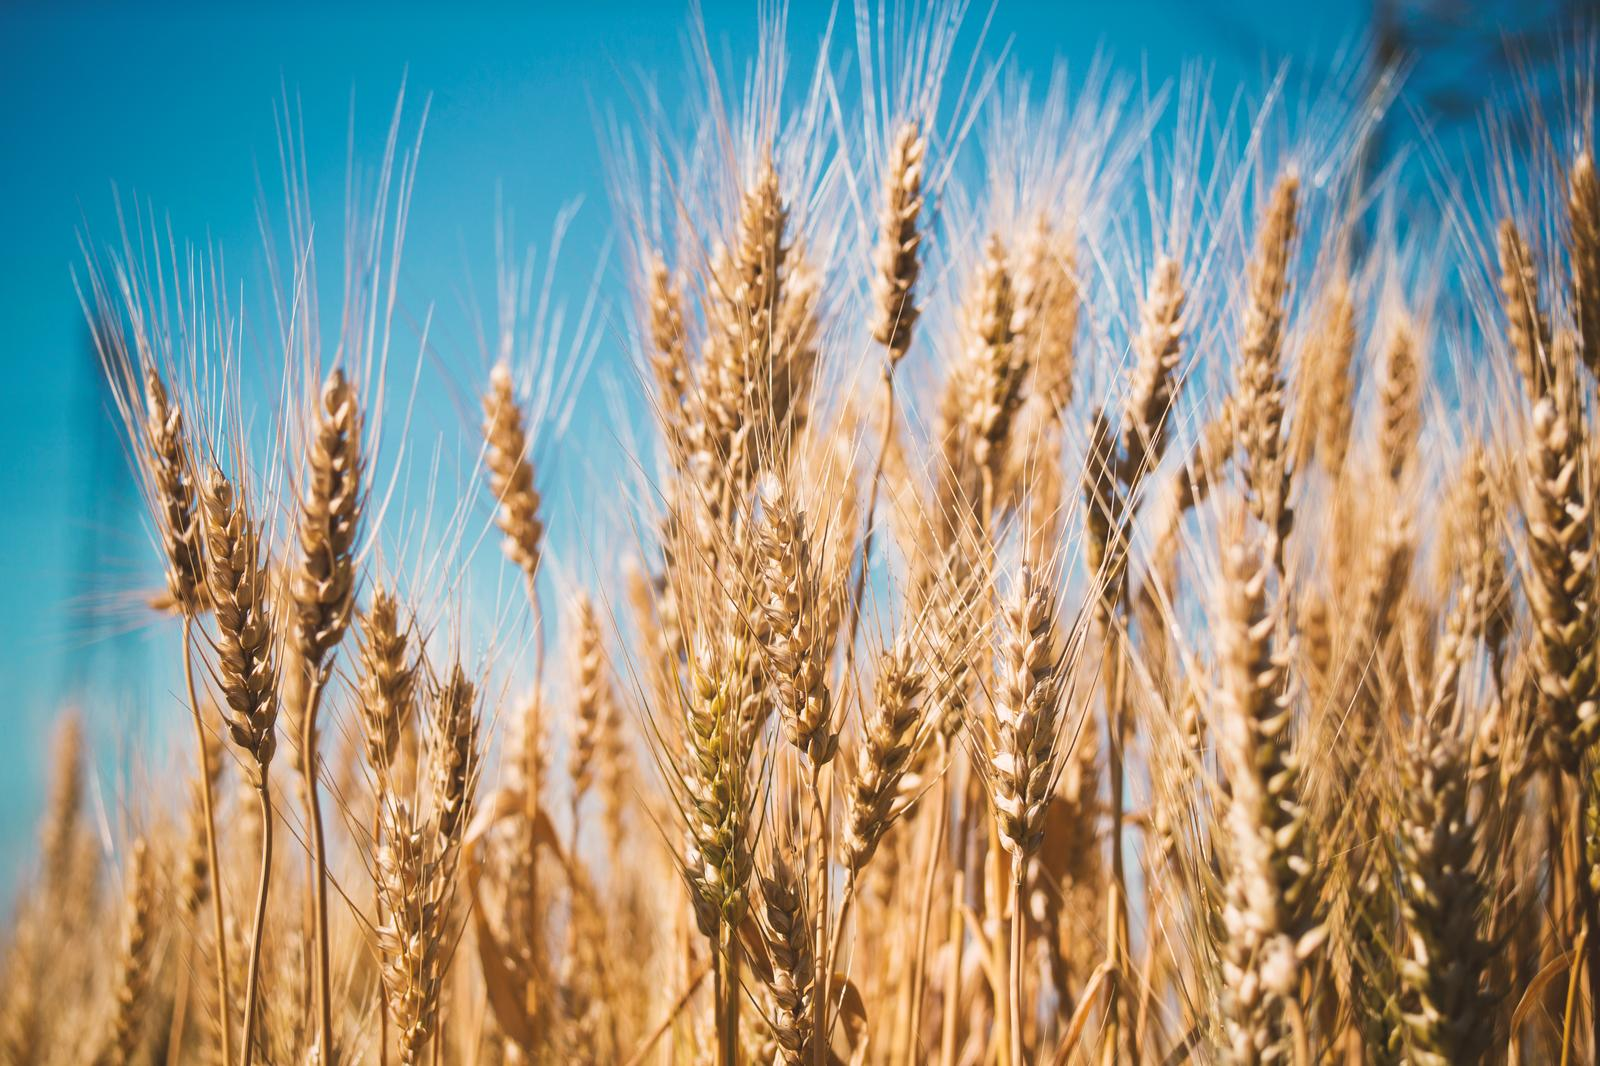 Growing of cereals (except rice), leguminous crops and oil seeds in Järva county